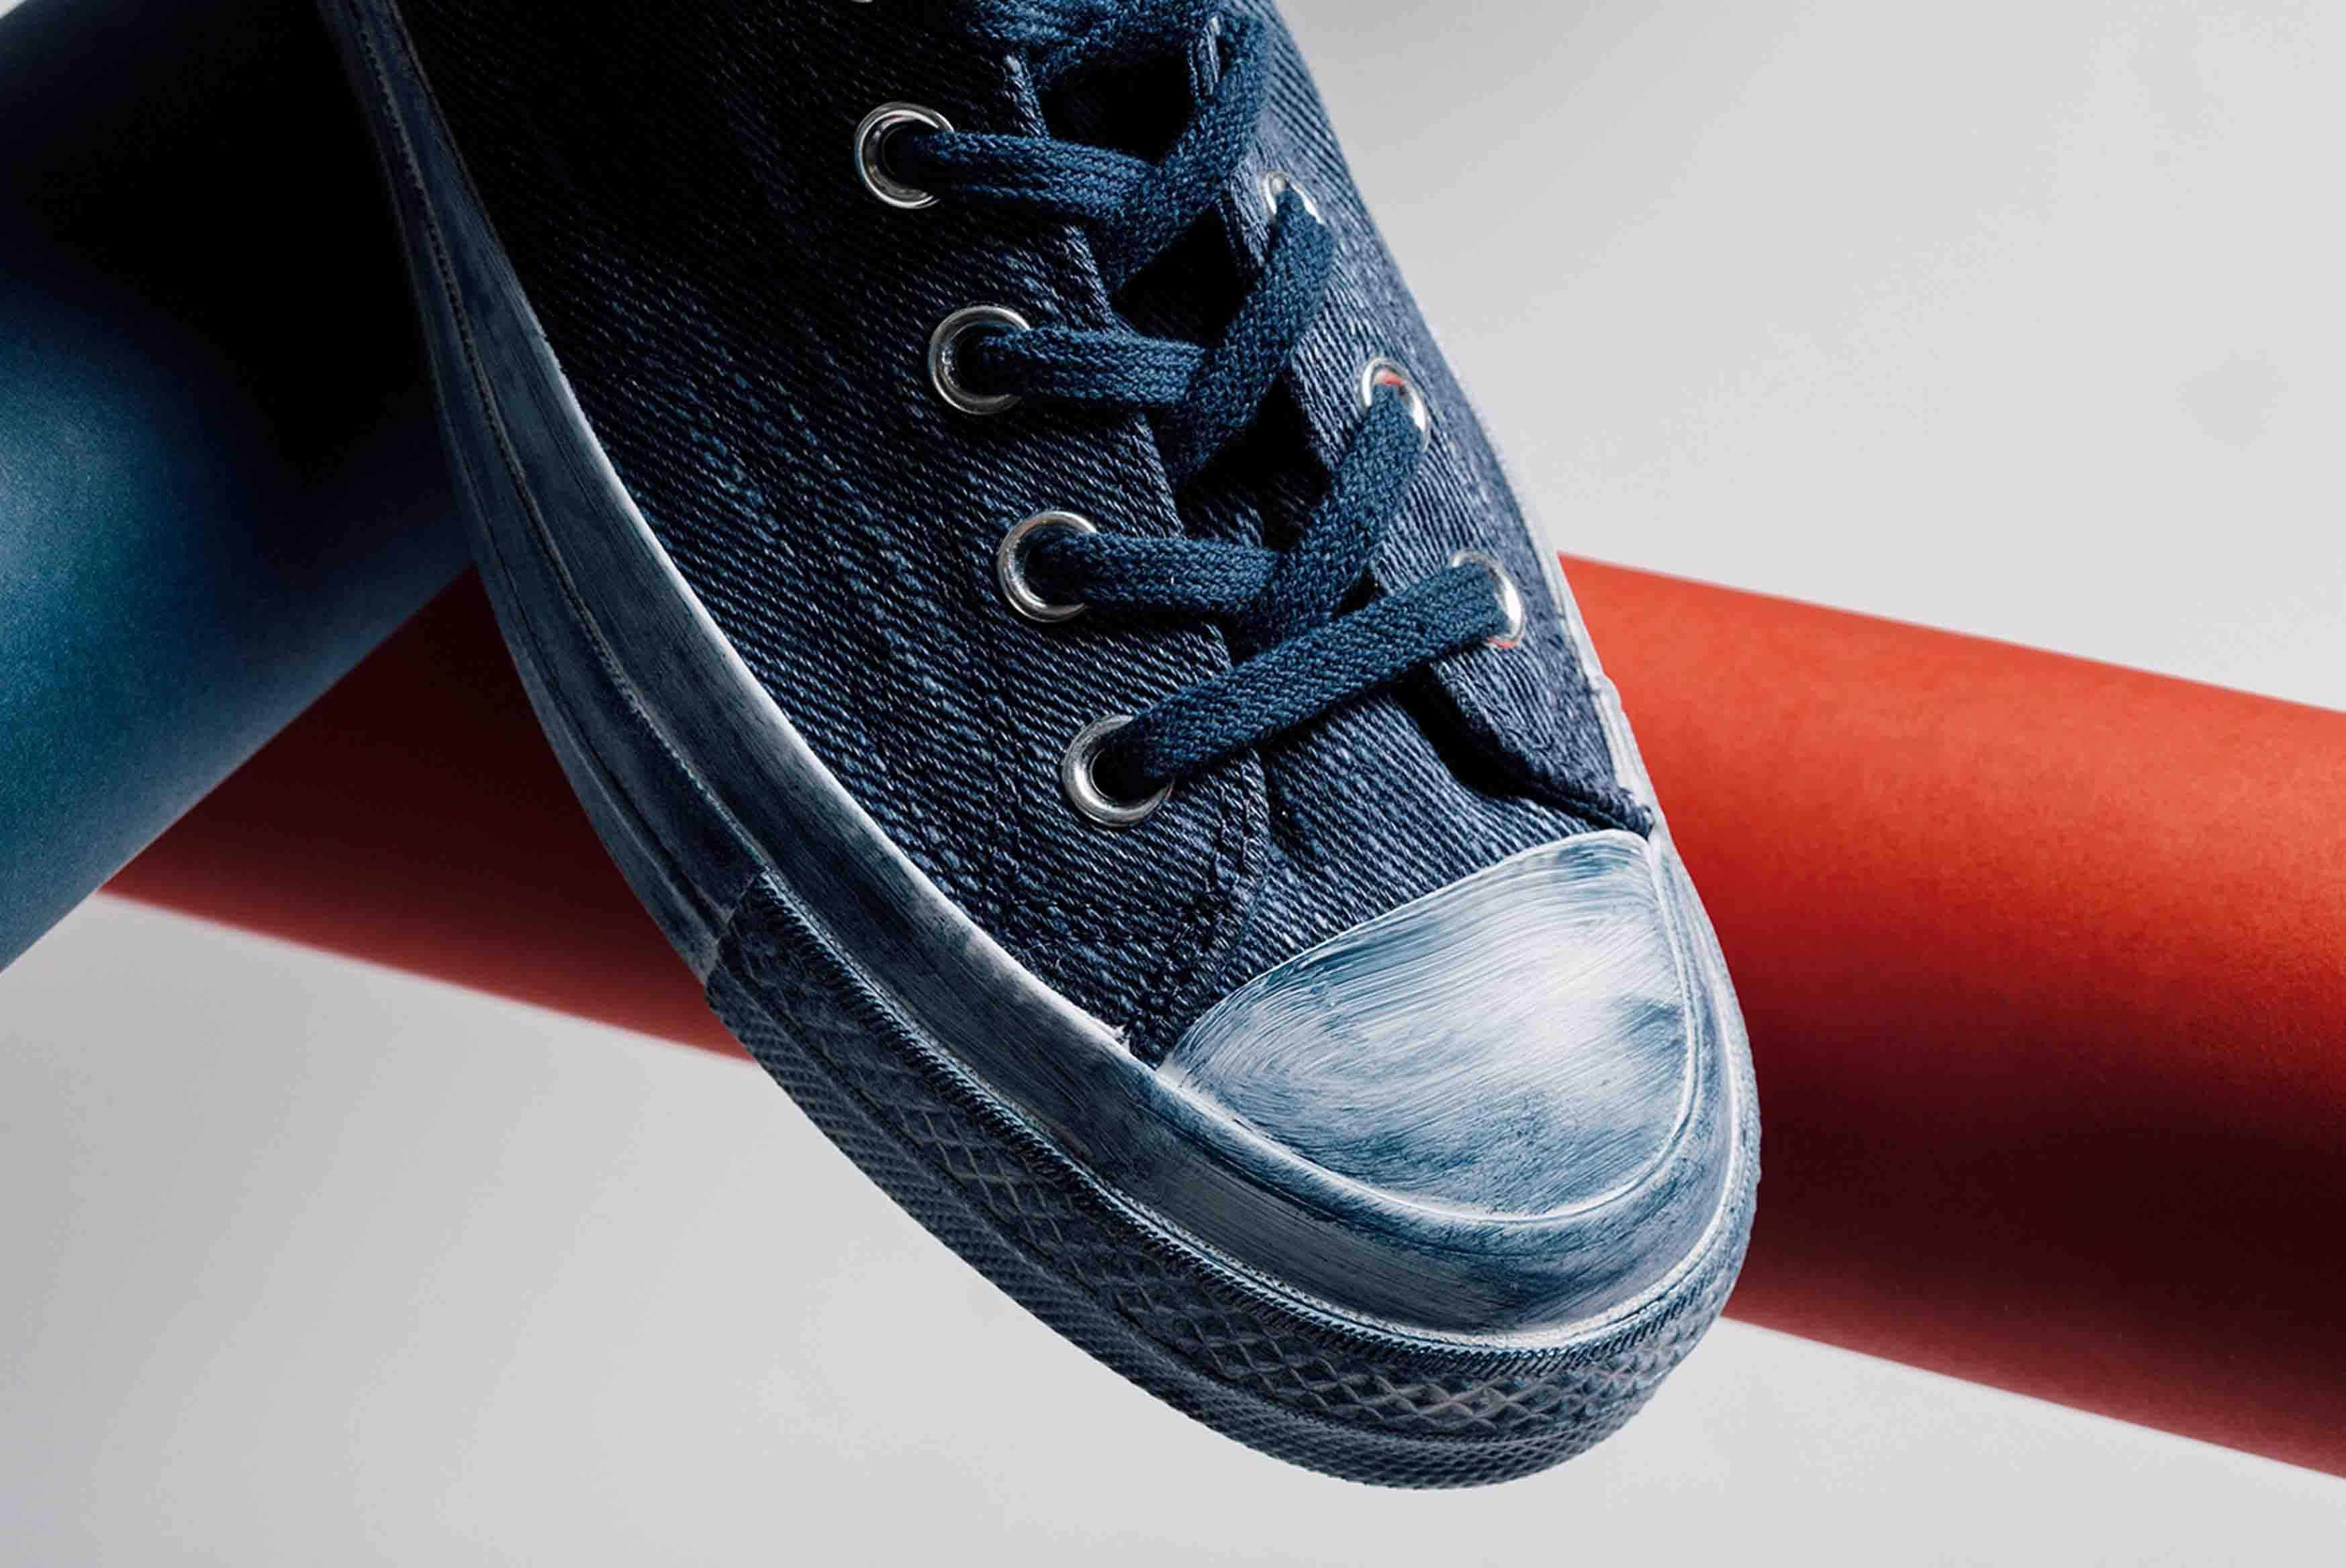 Converse Chuck 70 Hi Overdryed Wash Pack 004 Sneaker Freaker